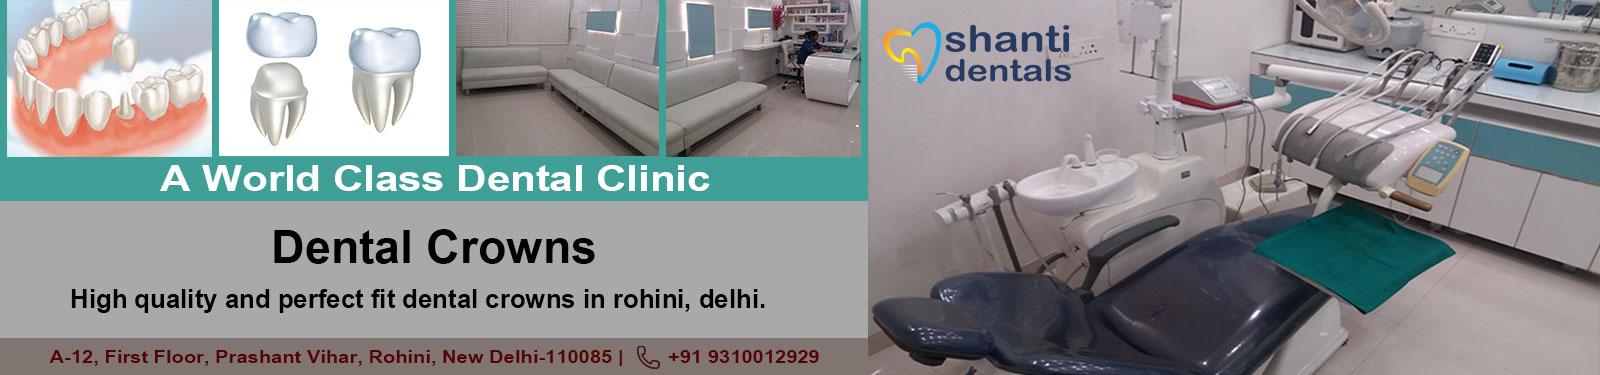 Dental Crowns Treatment-in Rohini Delhi By Shanti Dentals